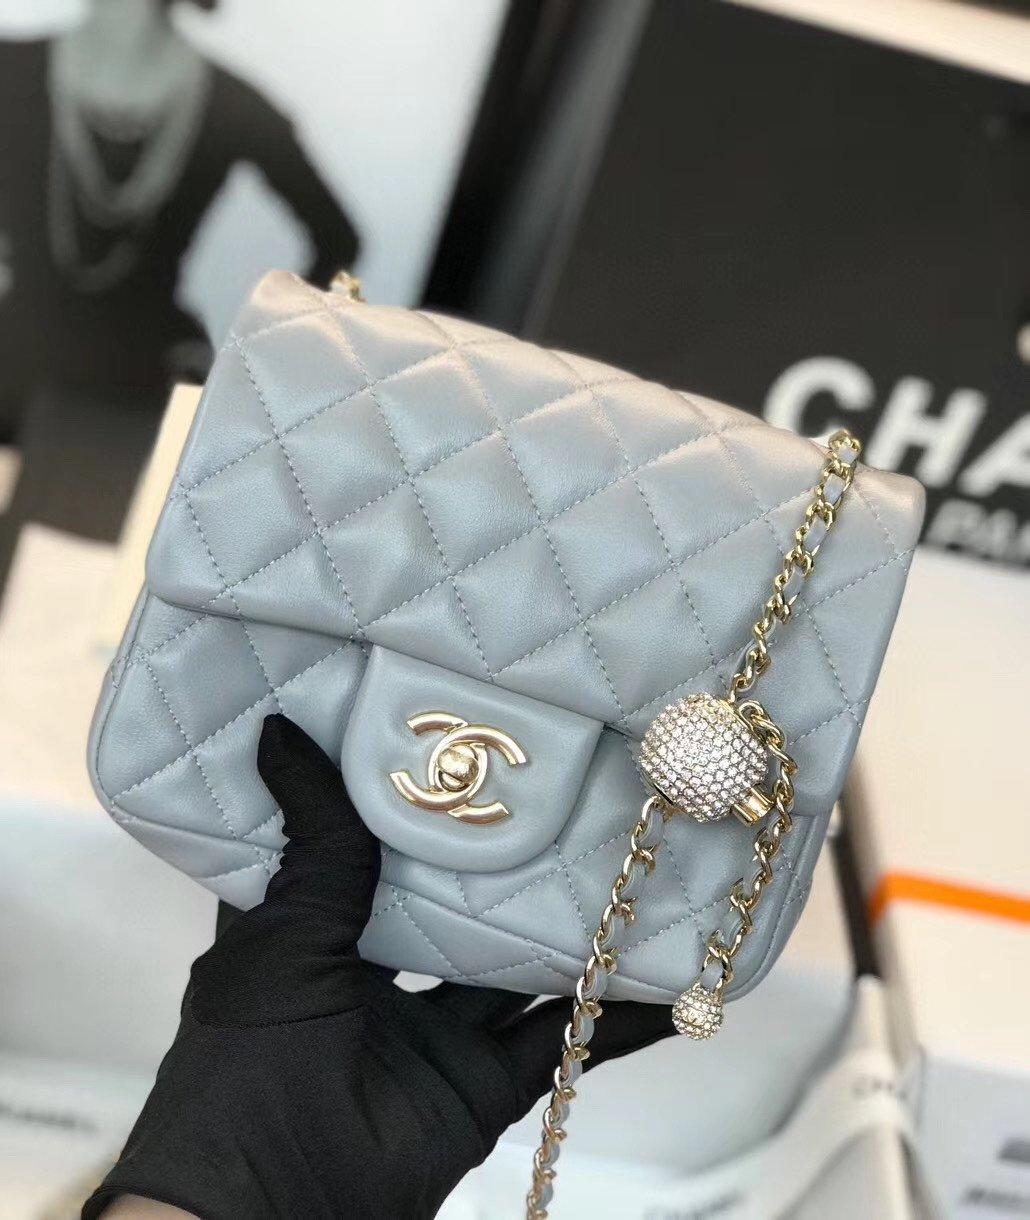 Chanel香奈儿专柜最新钻珠cf款(图2)